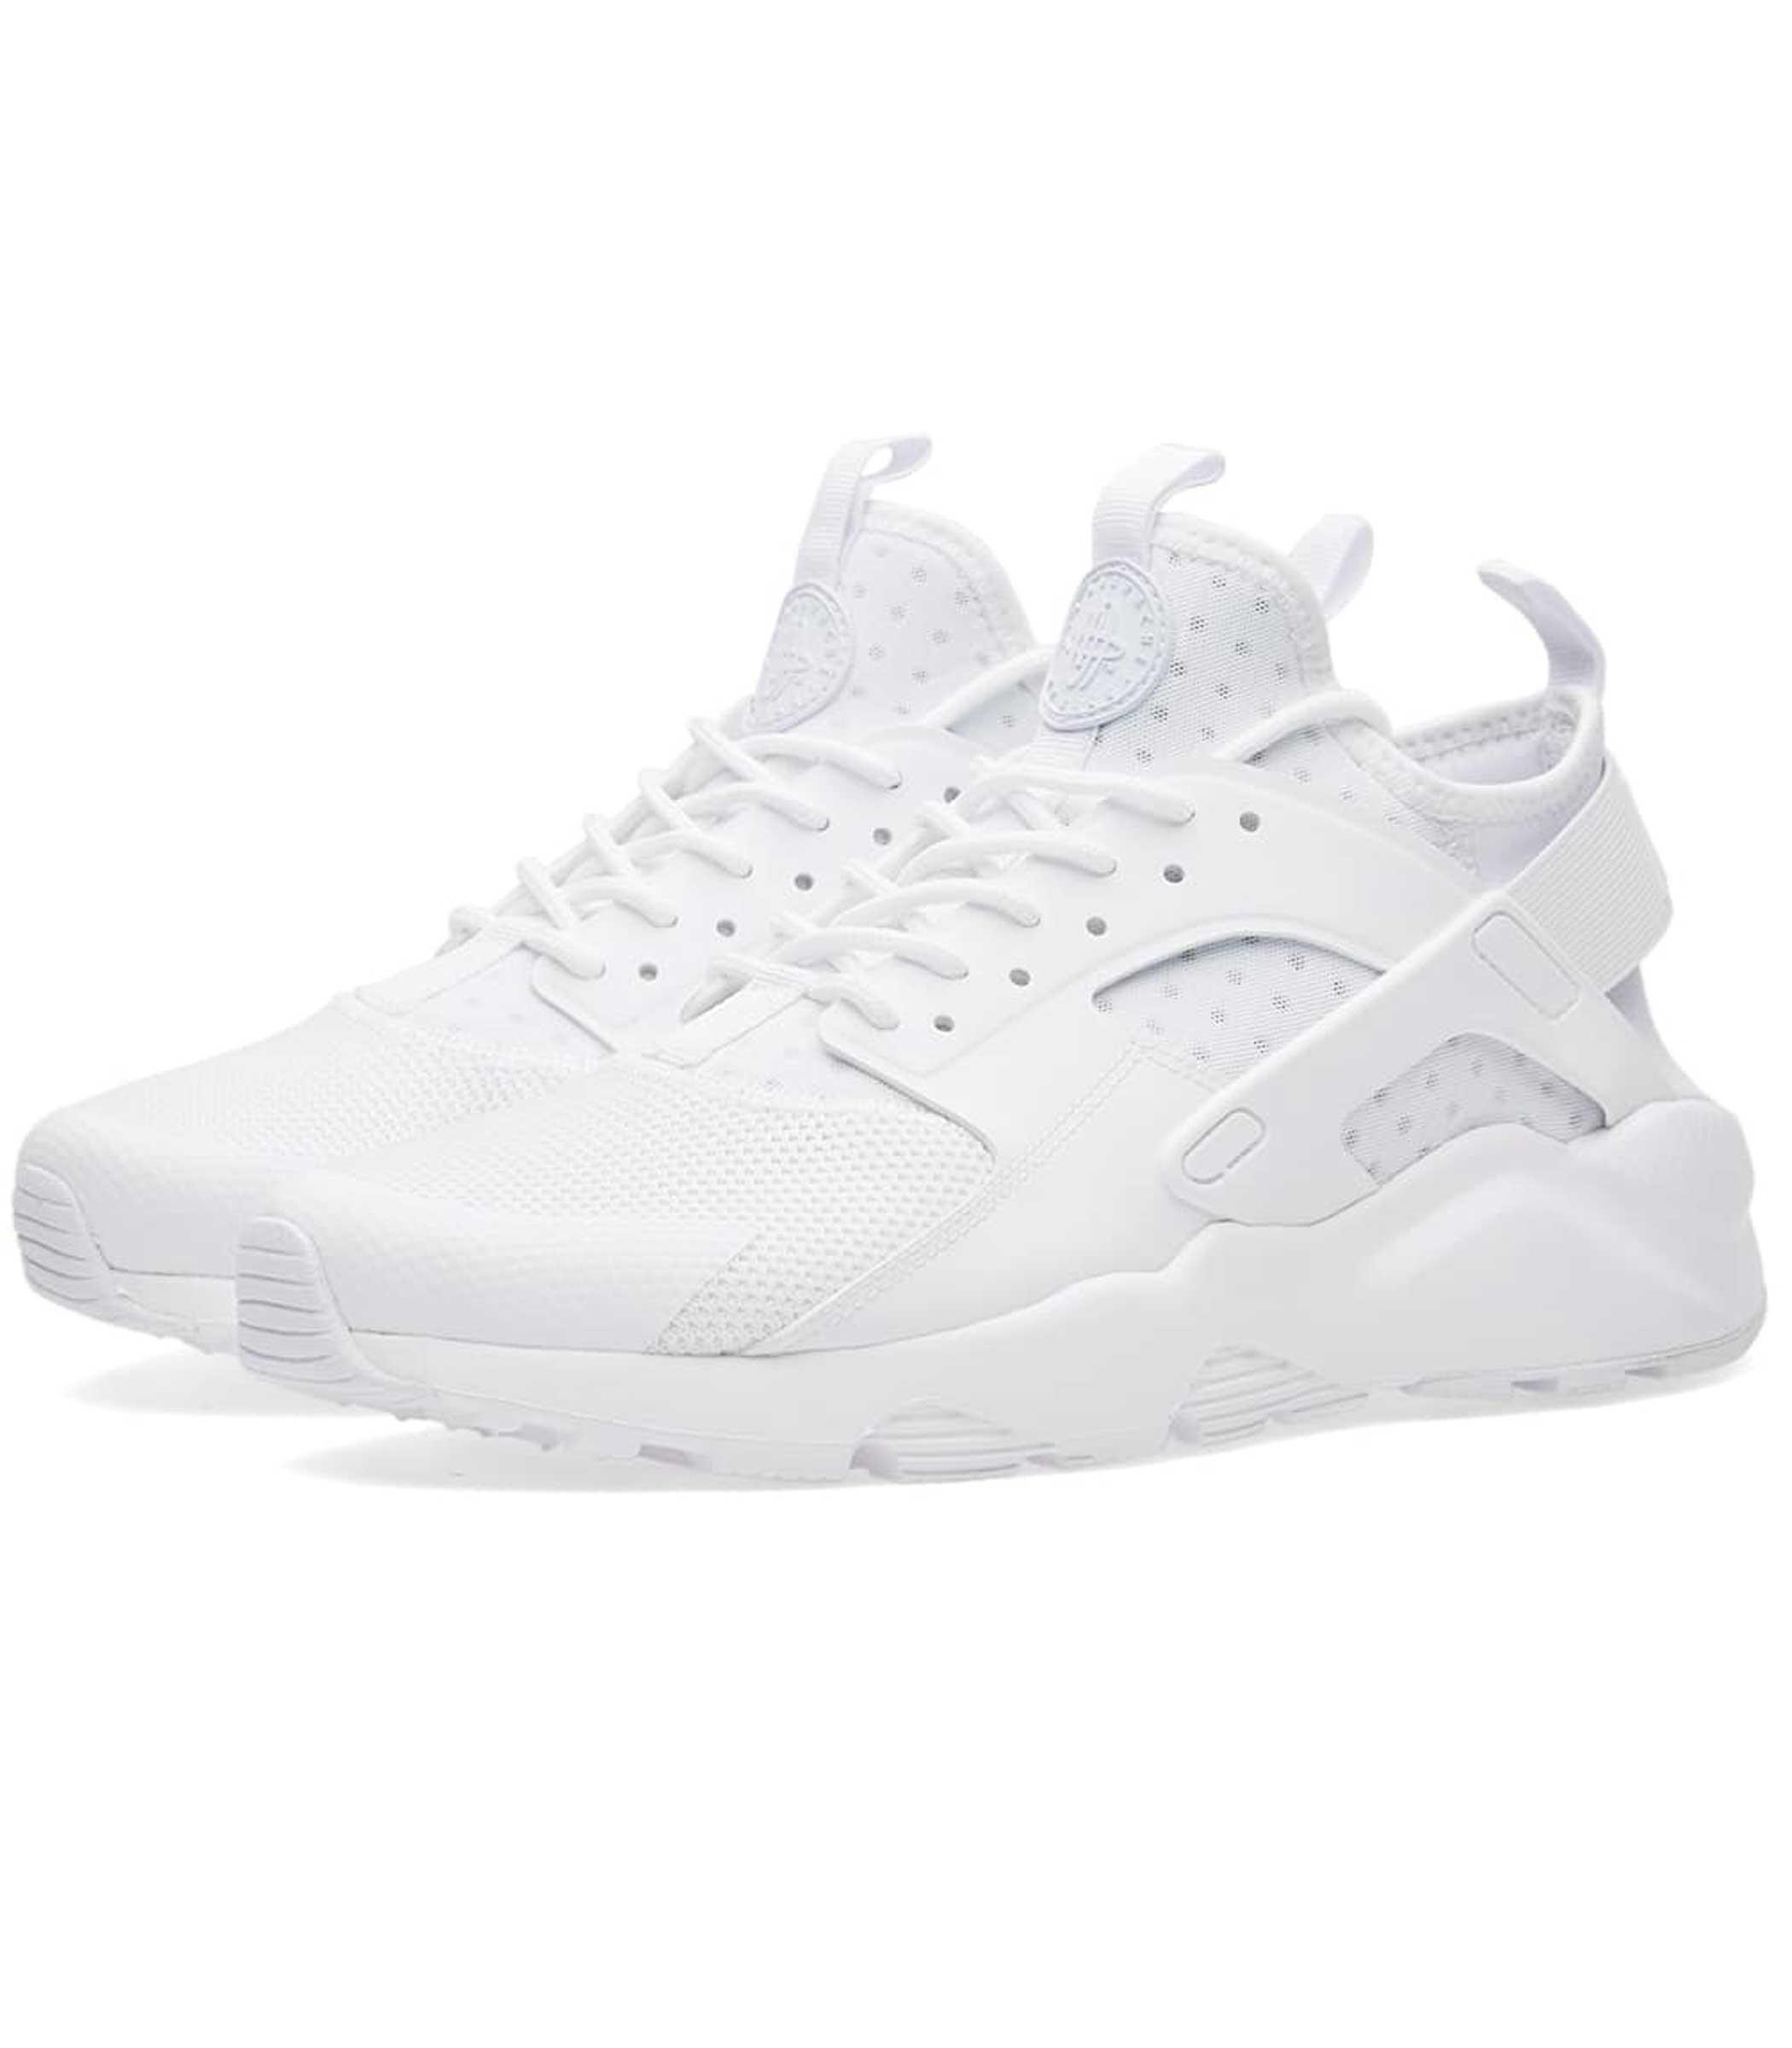 Scarpe Nike Air Huarache Run Ultra 819685 101 www